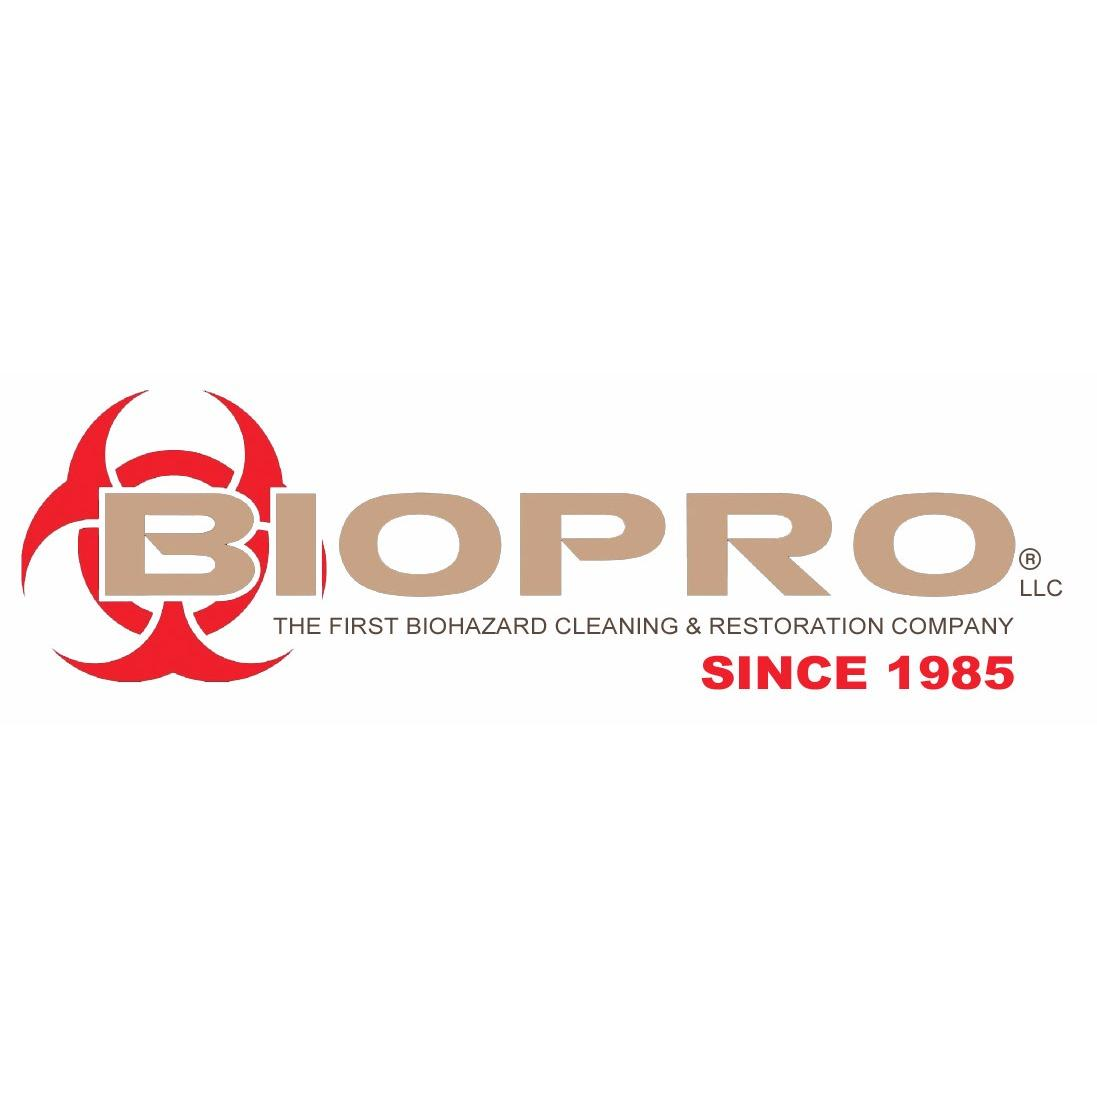 BIOPRO, LLC